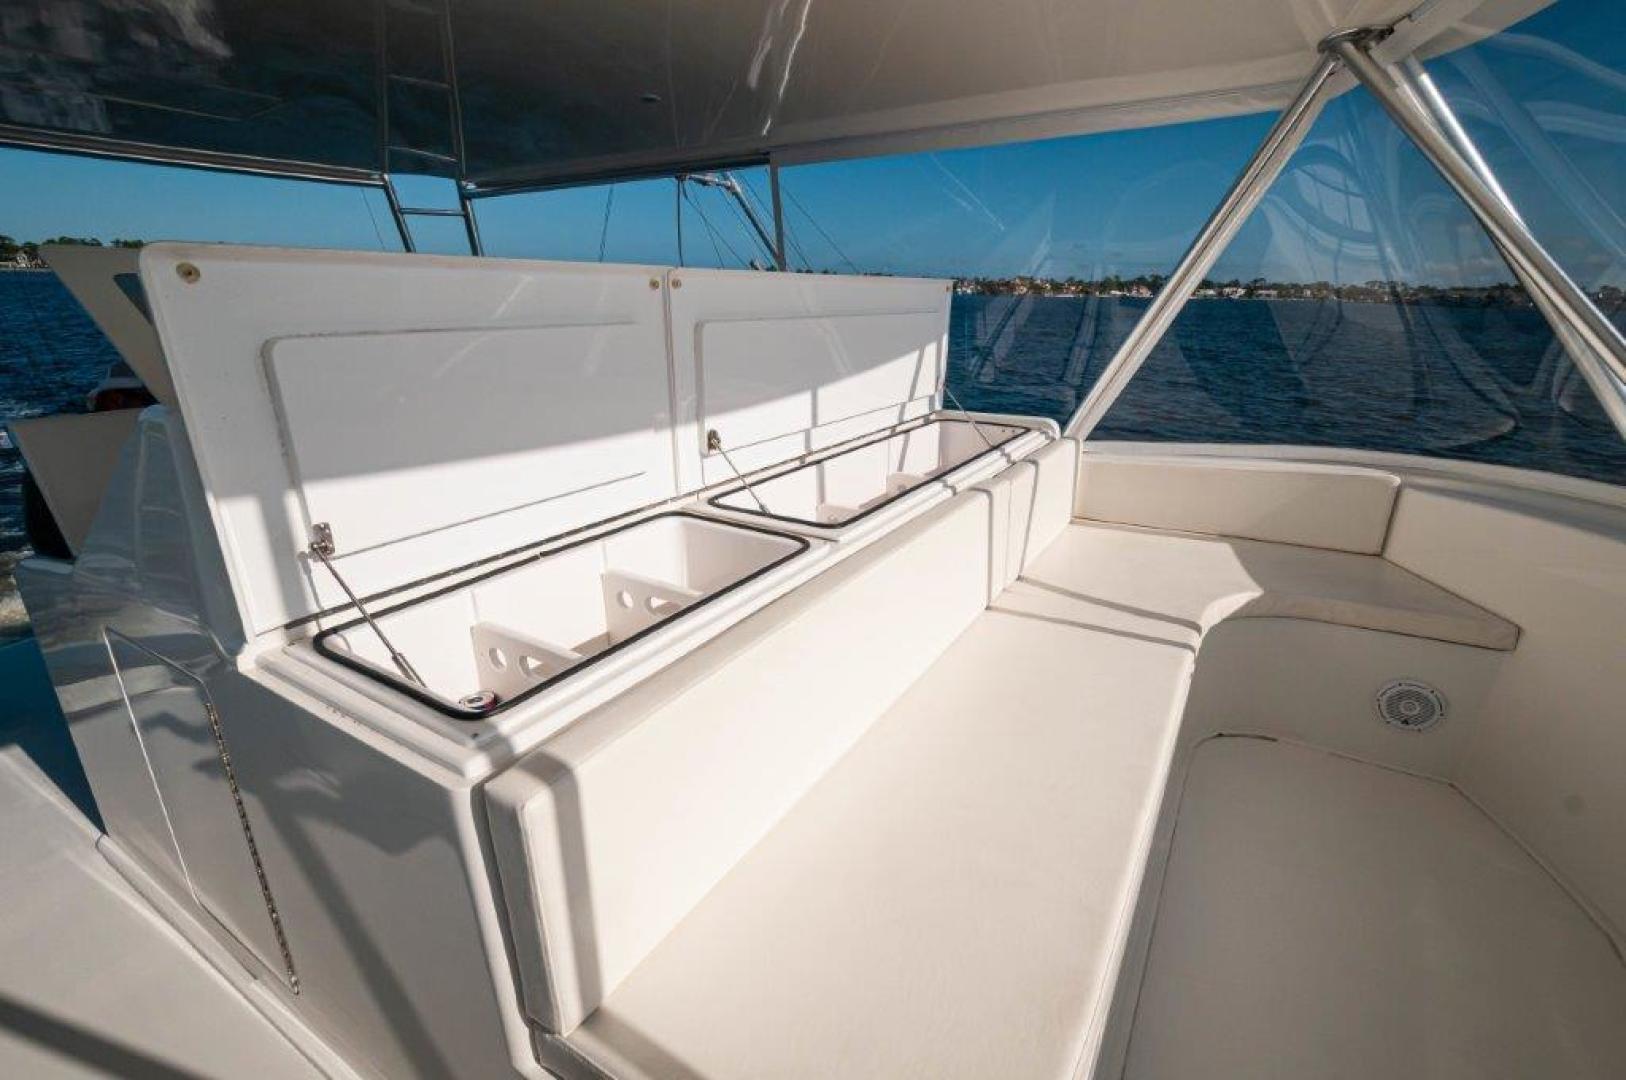 Viking-61 Convertible 2004-Second Wind Panama City Beach-Florida-United States-2004 61 Viking Convertible Second Wind Flybridge (3)-1545109 | Thumbnail